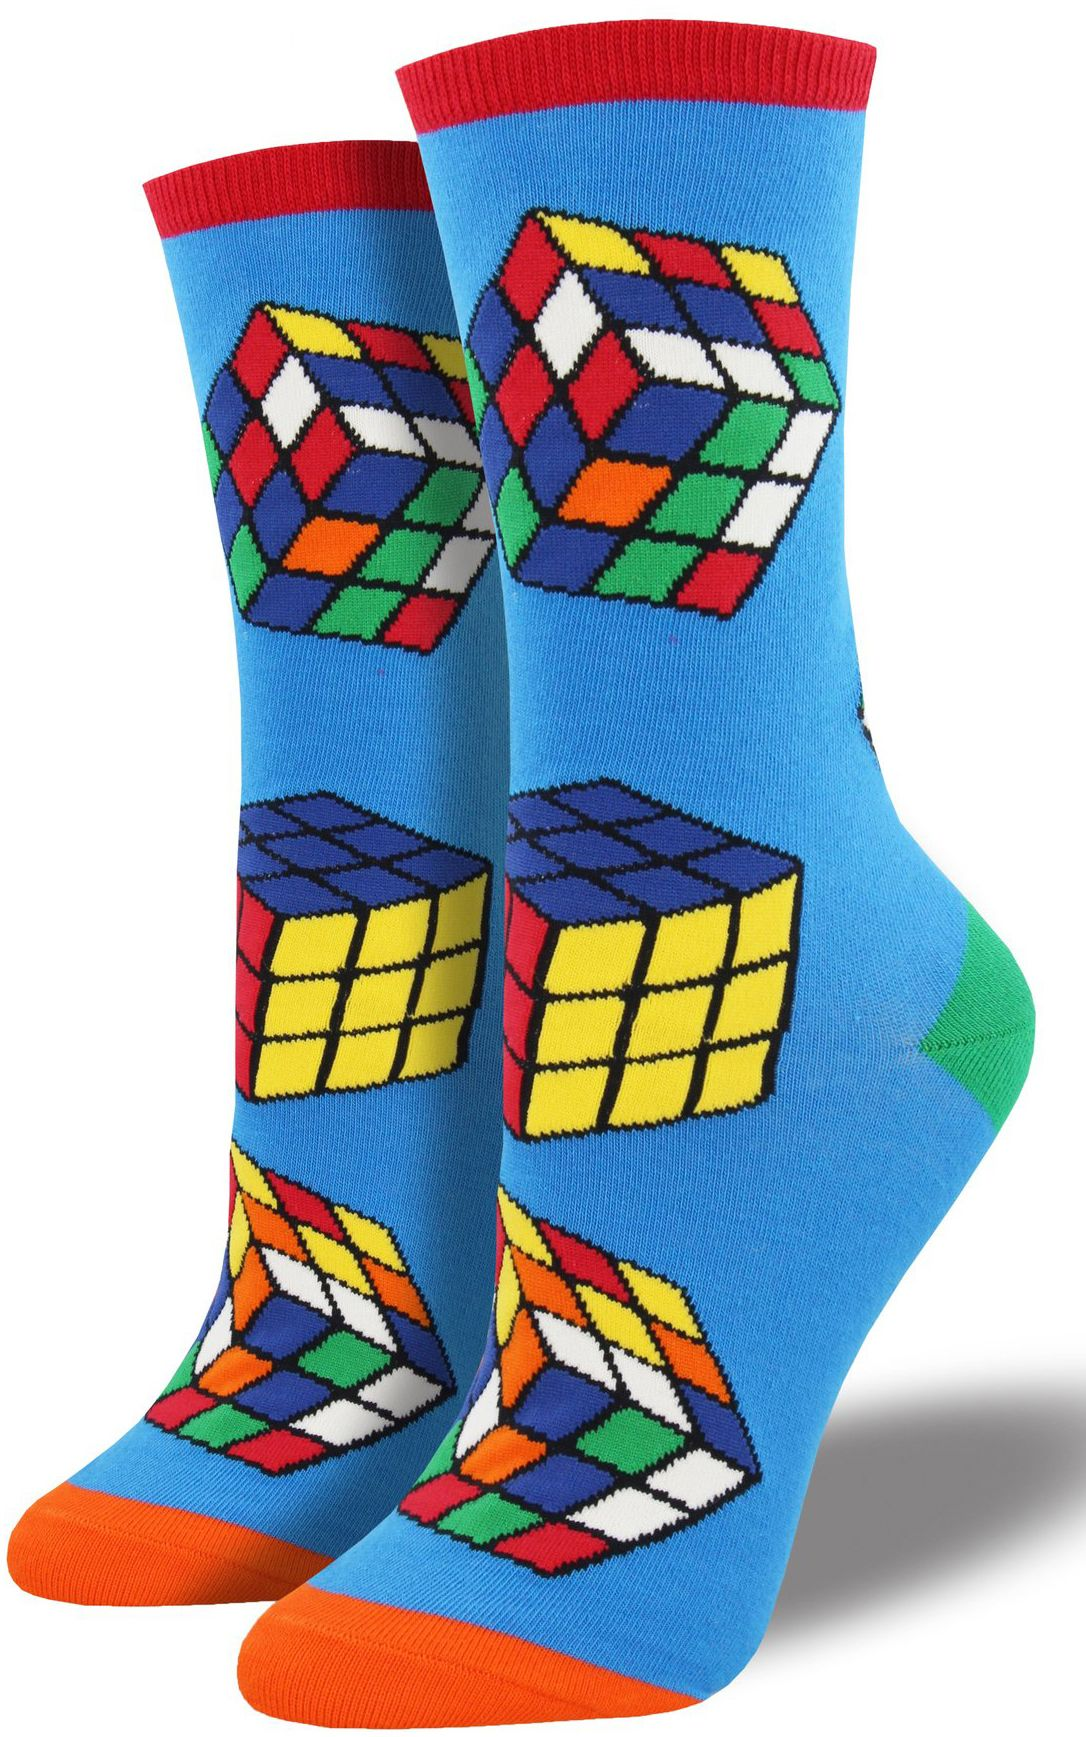 Rubiks Cube Crew Socks Socks Pinterest Crew Socks Socks And Cube